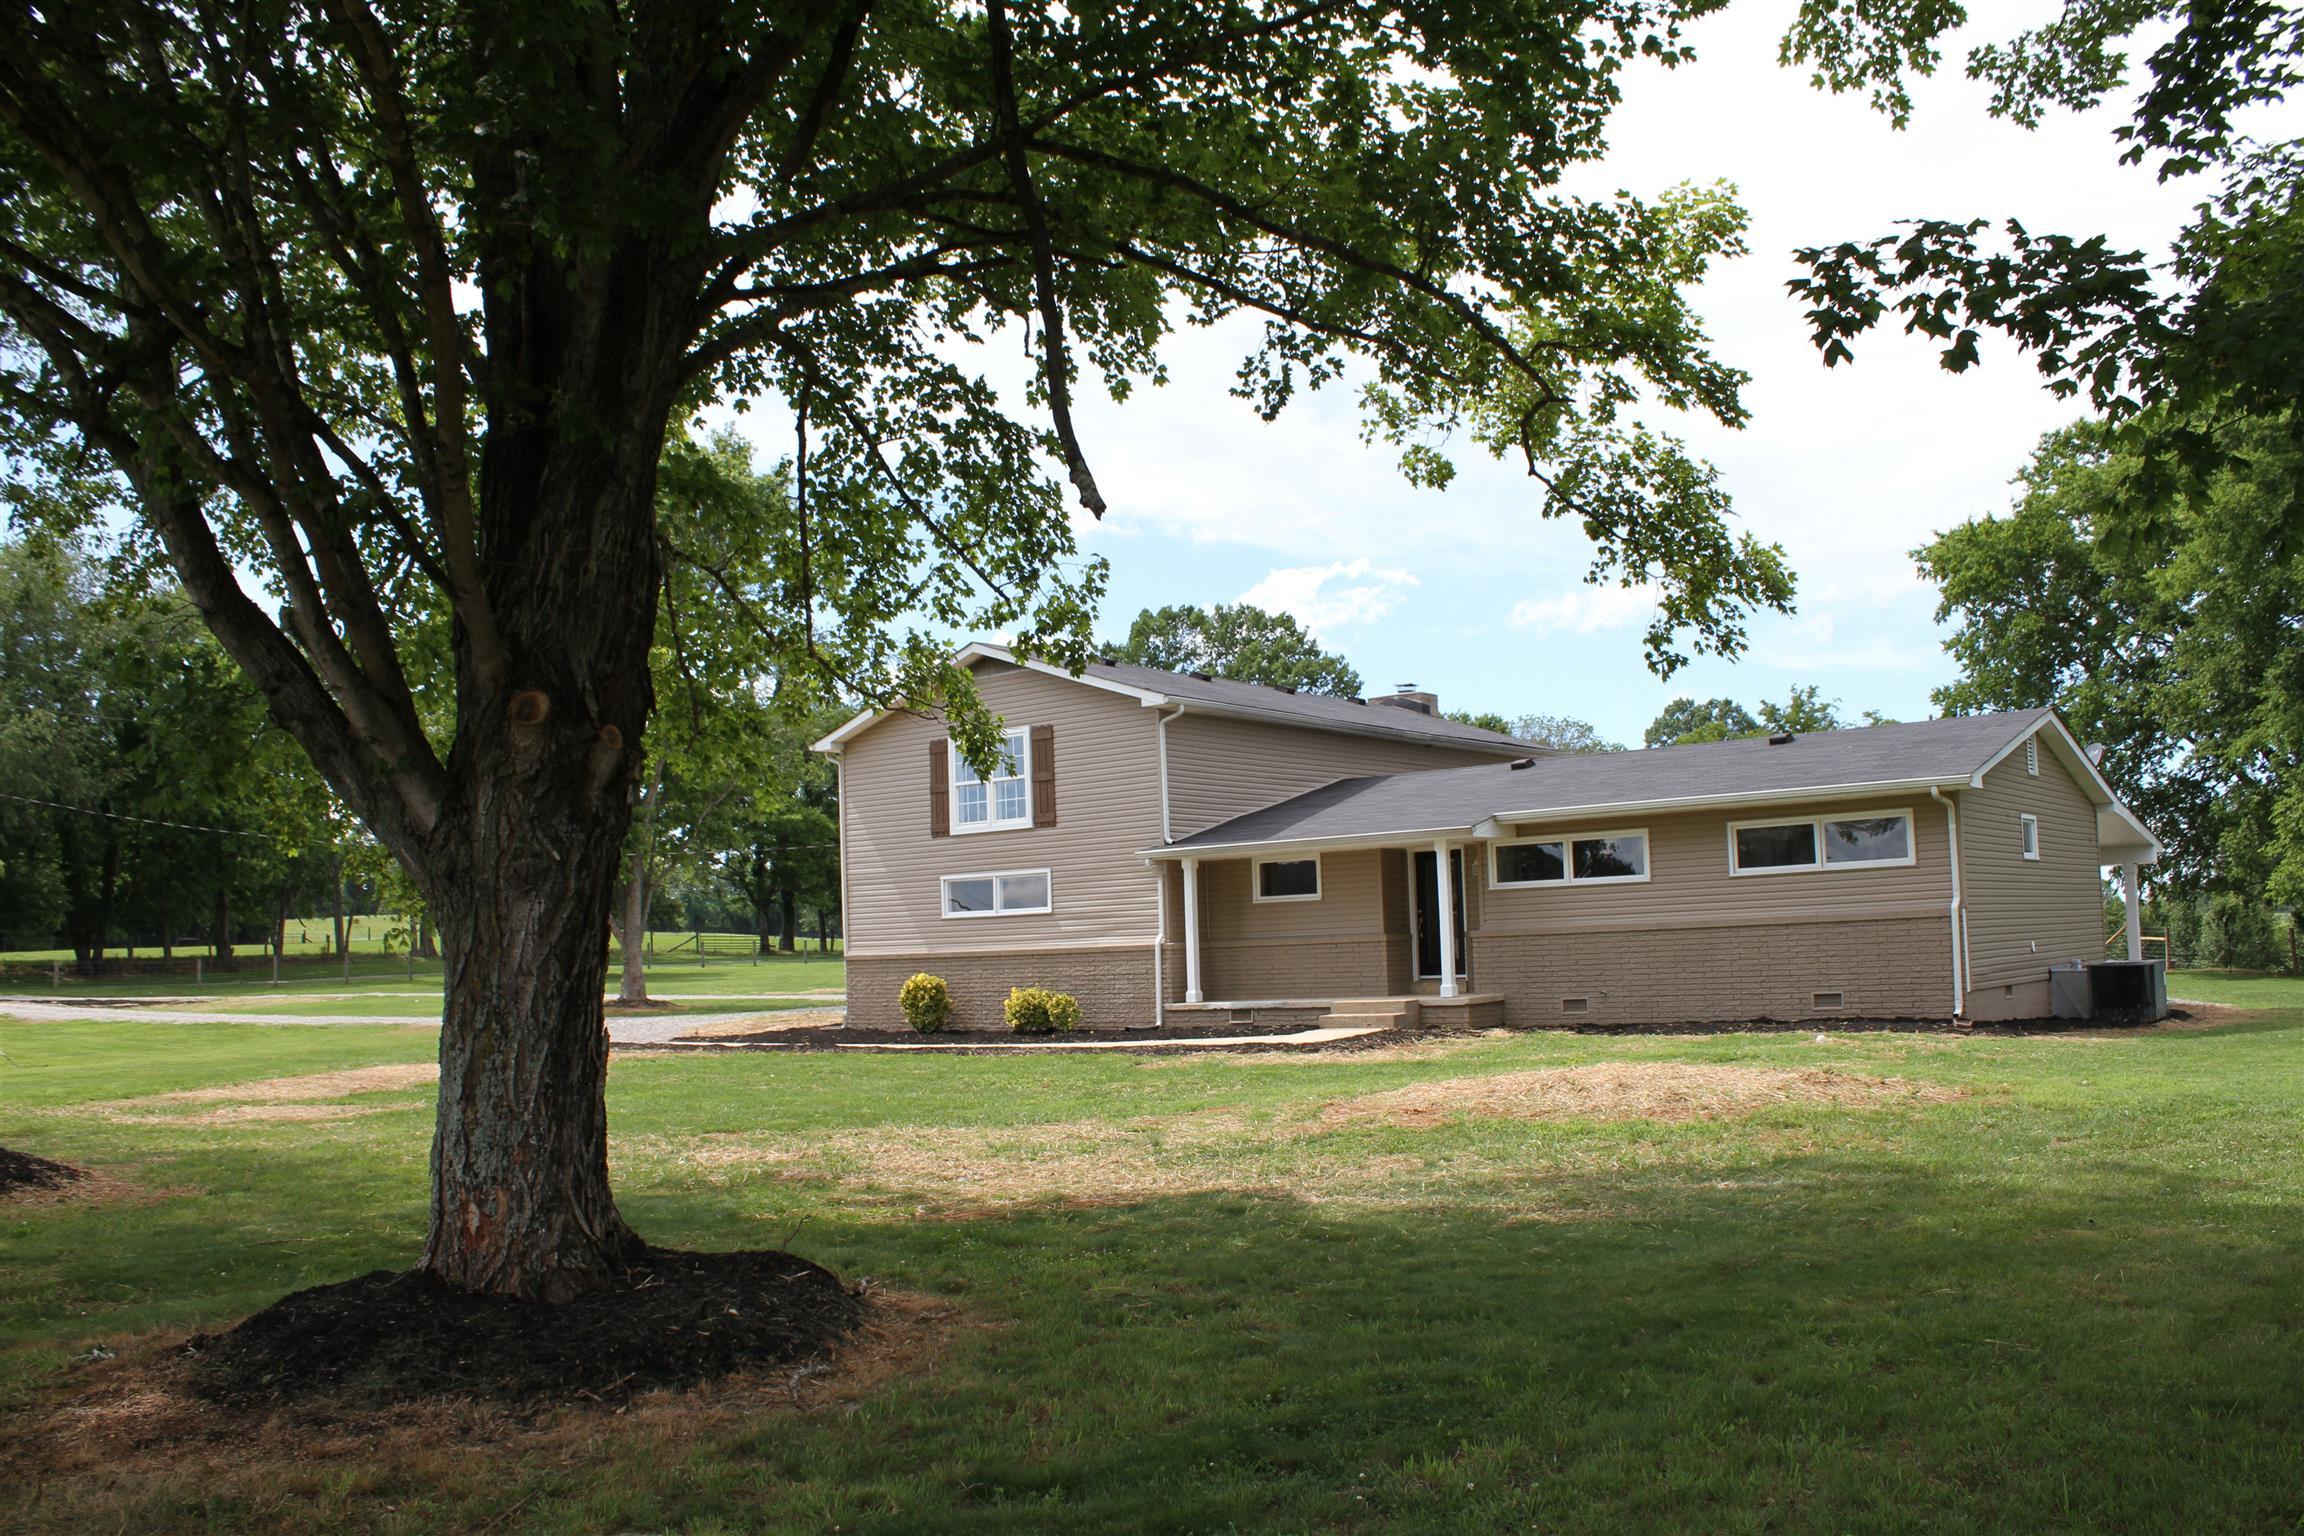 1428 Highway 64 W, Shelbyville, TN 37160 - Shelbyville, TN real estate listing